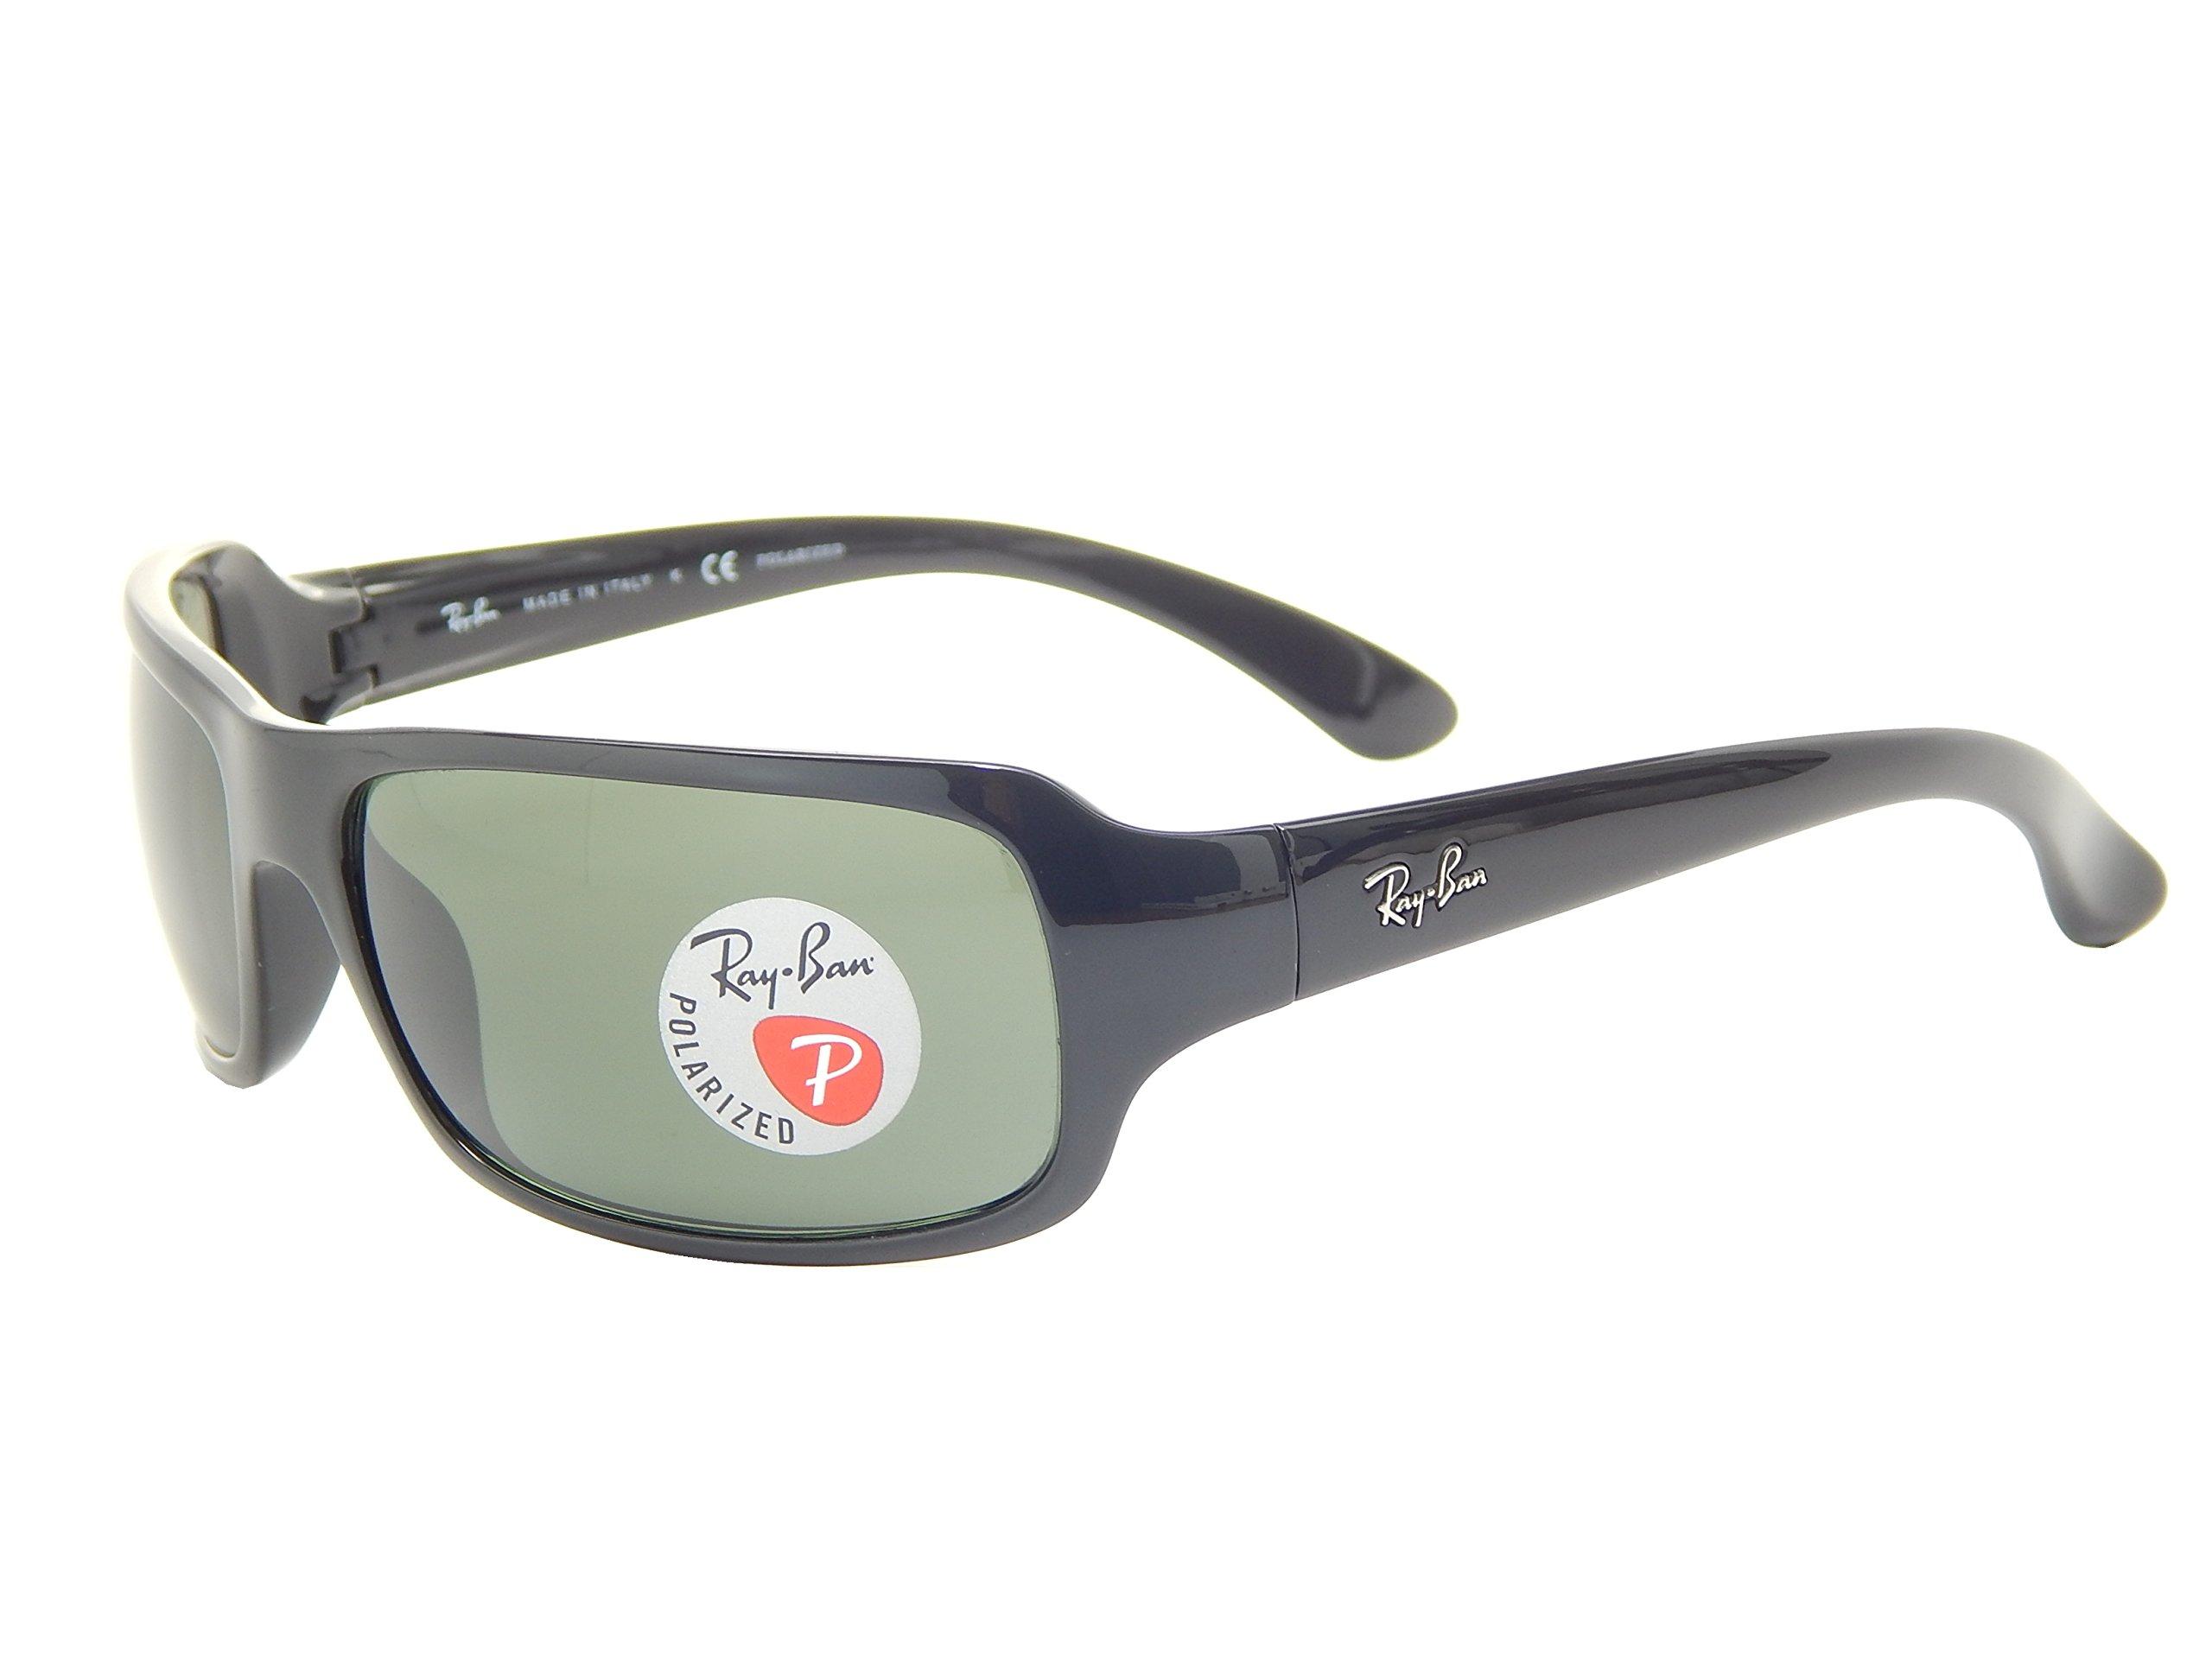 2fc60ca138b New Ray Ban RB4075 601 58 Glossy Black G-15 XLT Polarized 61mm Sunglasses  Apparel